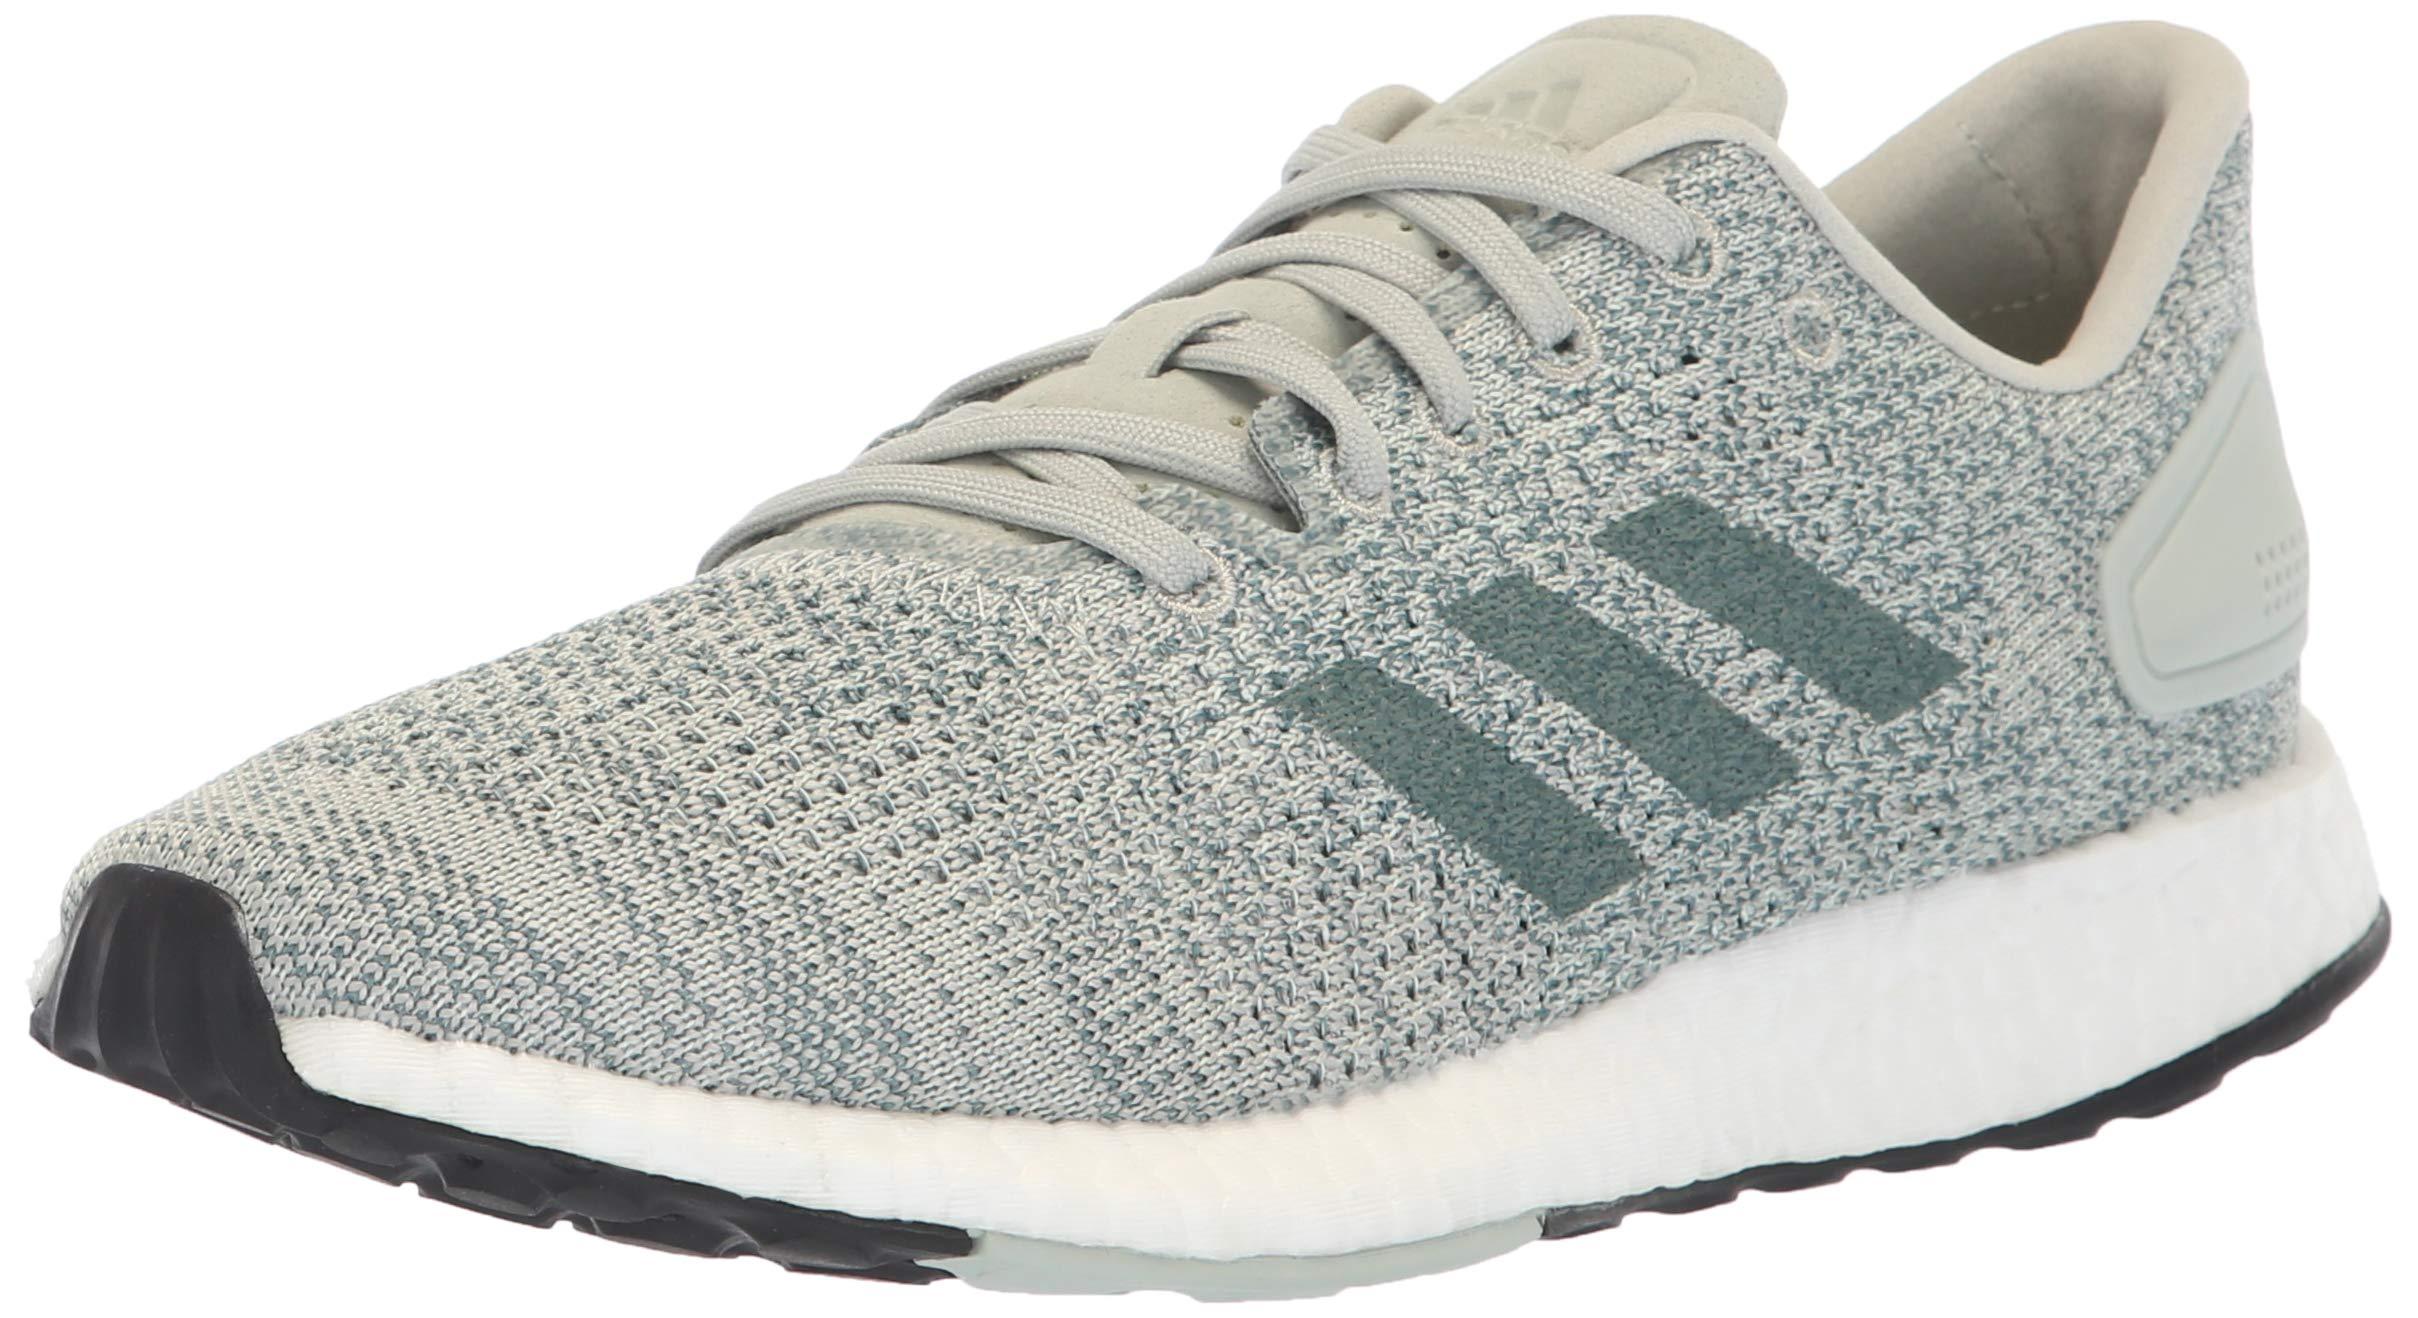 adidas Women's Pureboost DPR Running Shoes, ash Silver/raw aero Green, 5.5 M US